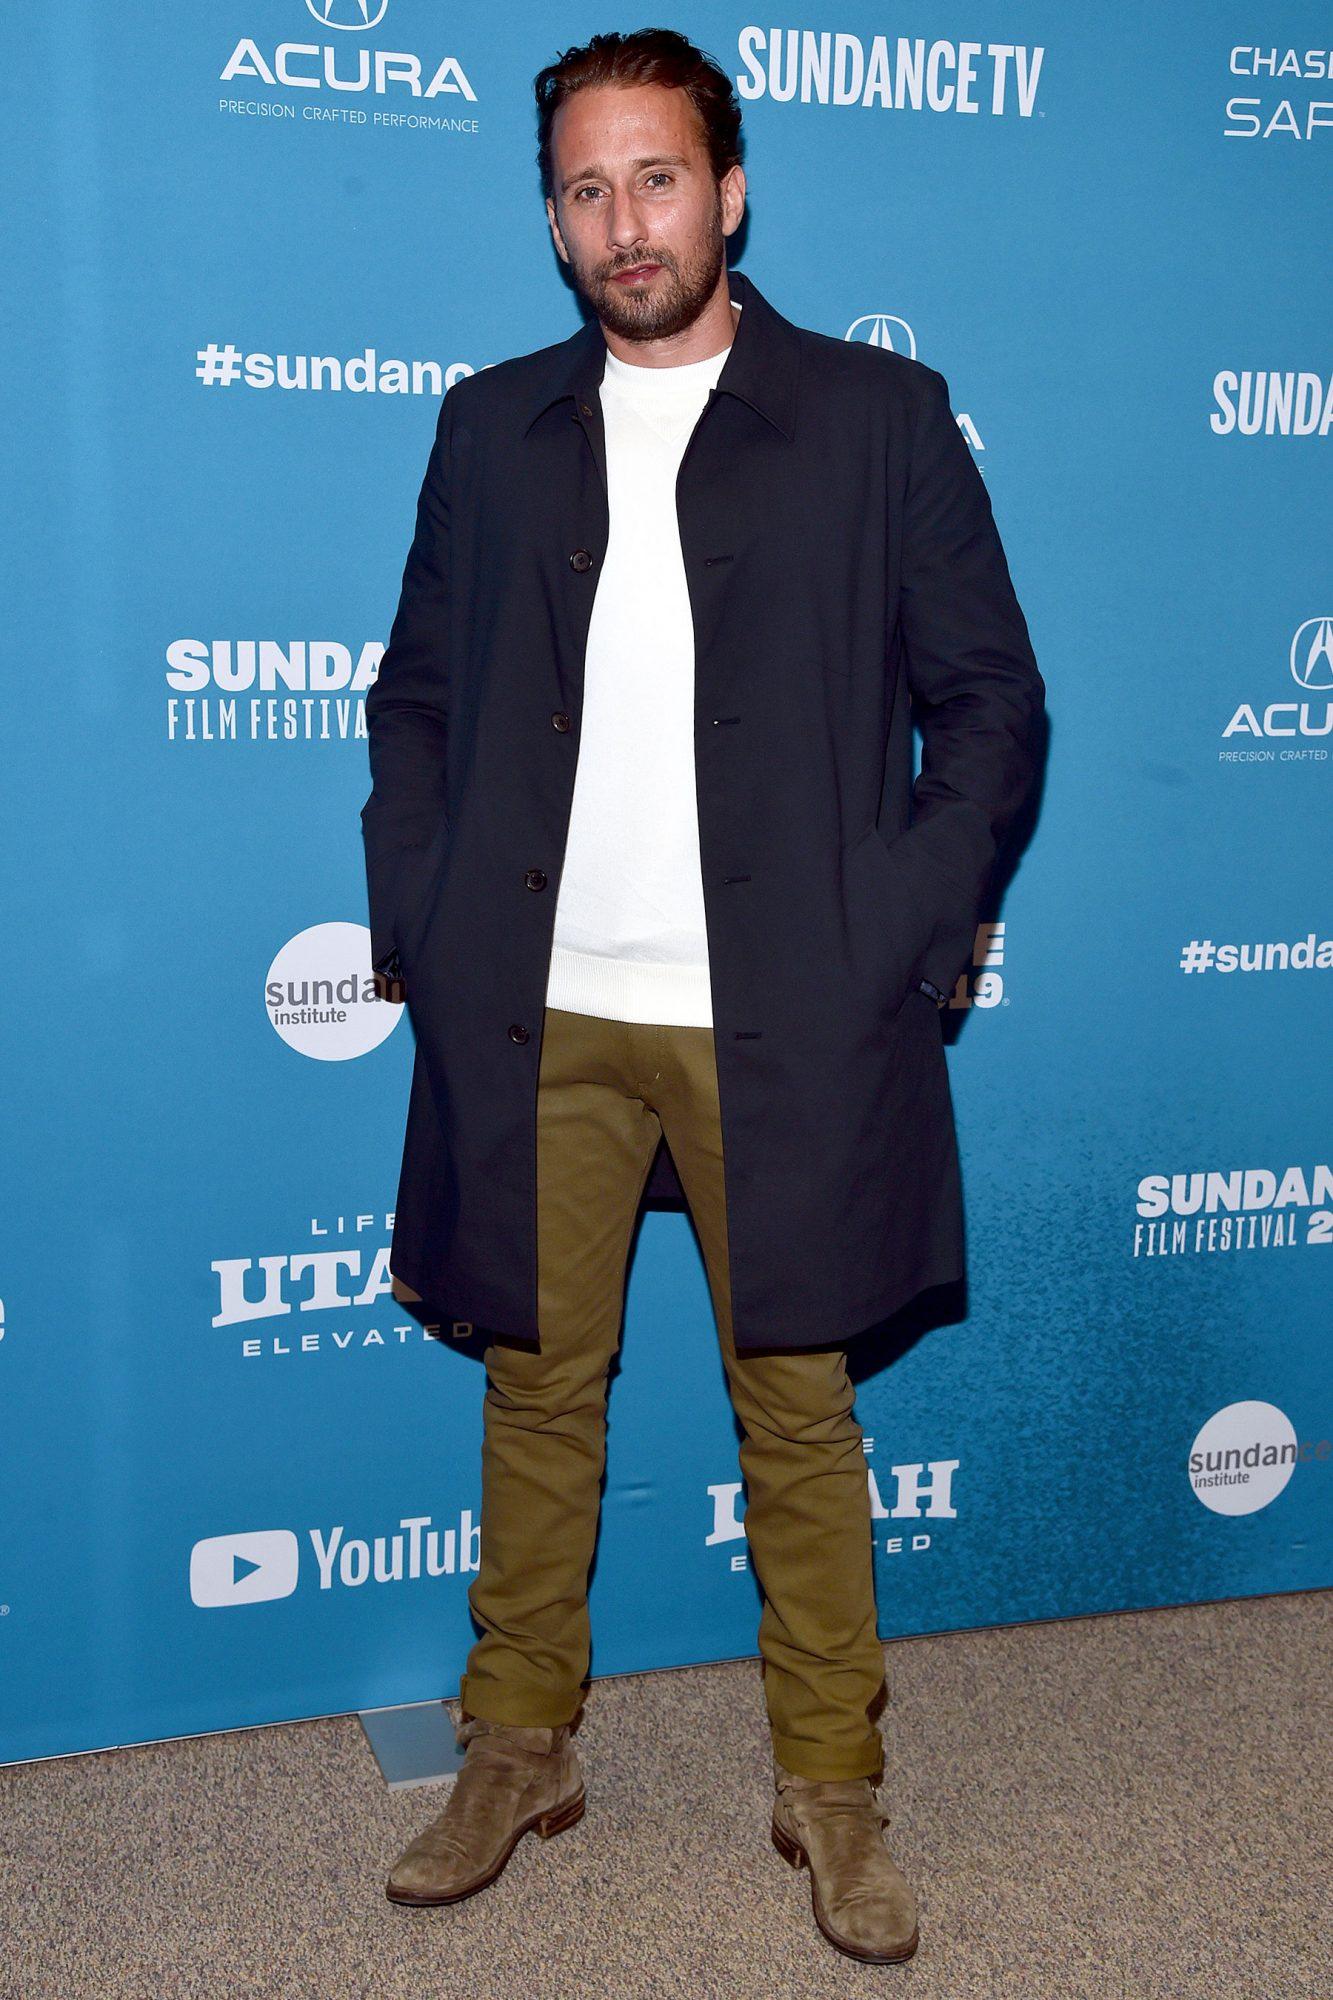 """The Mustang"" Sundance Premiere - Thursday, January 31st"